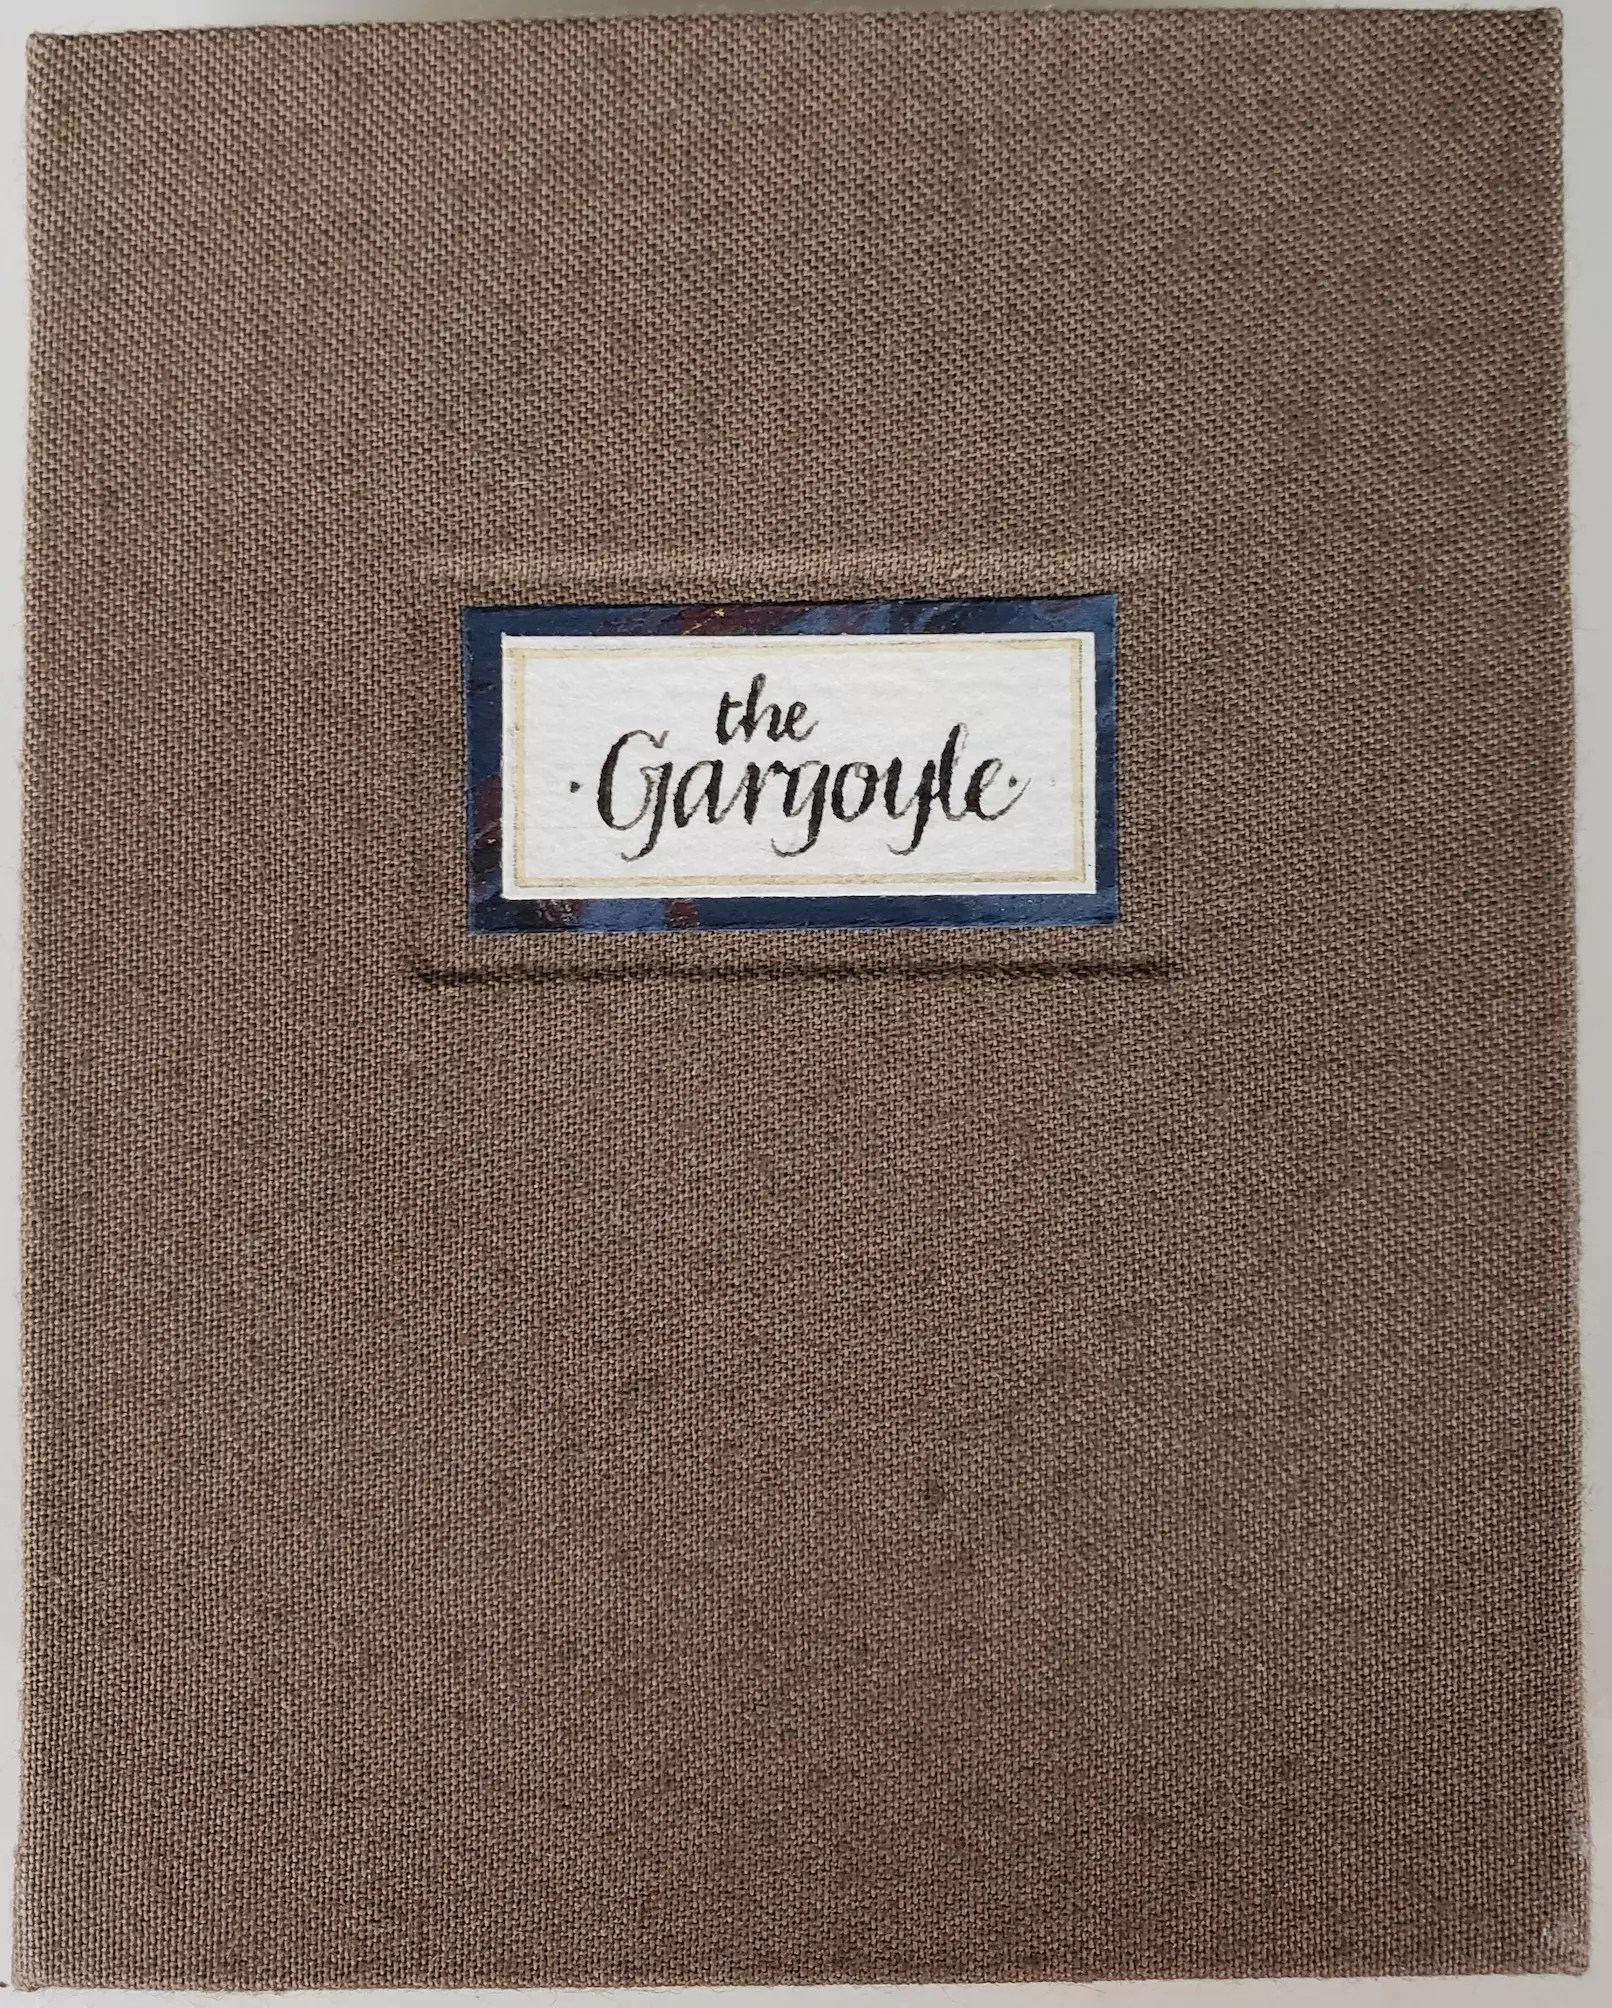 1988 CVS The Gargoyle cover